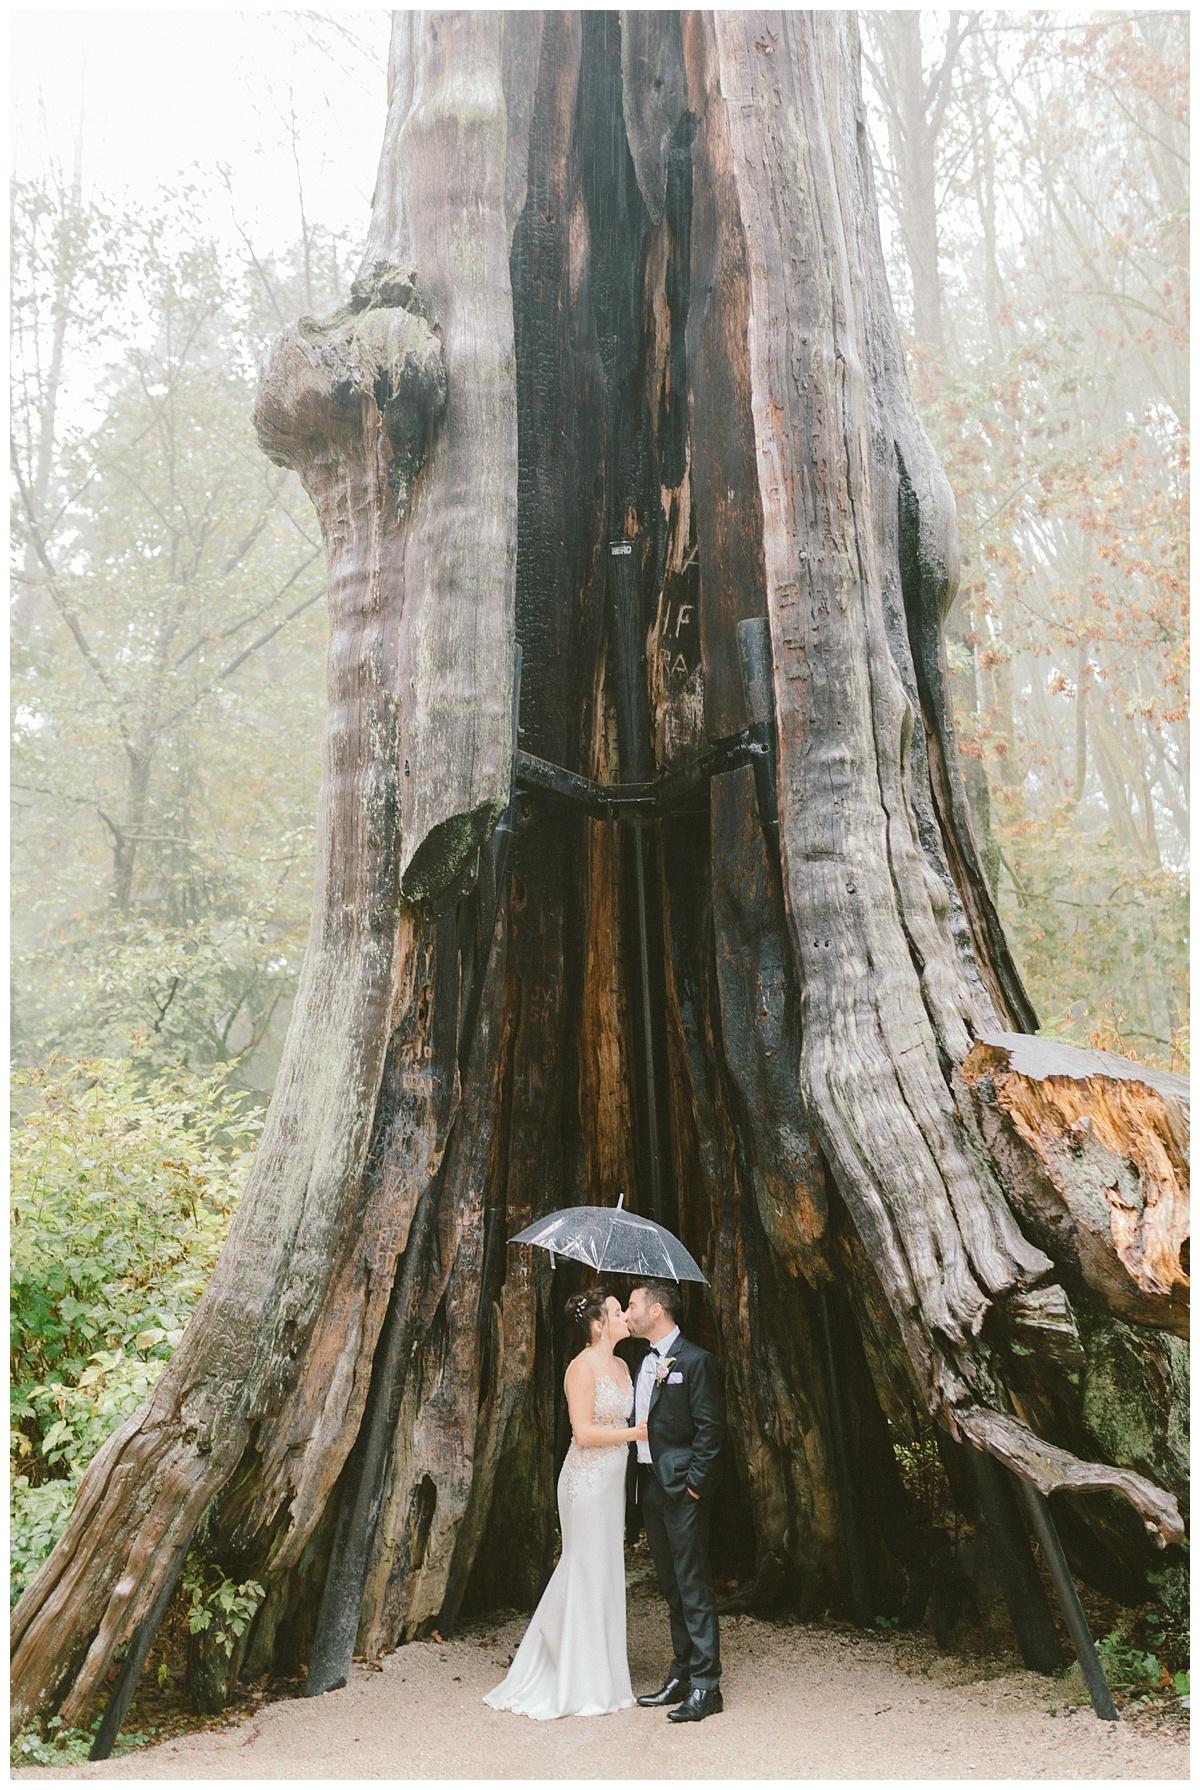 Fall Wedding prewedding photos downtown Vancouver BC (Stanley Park)